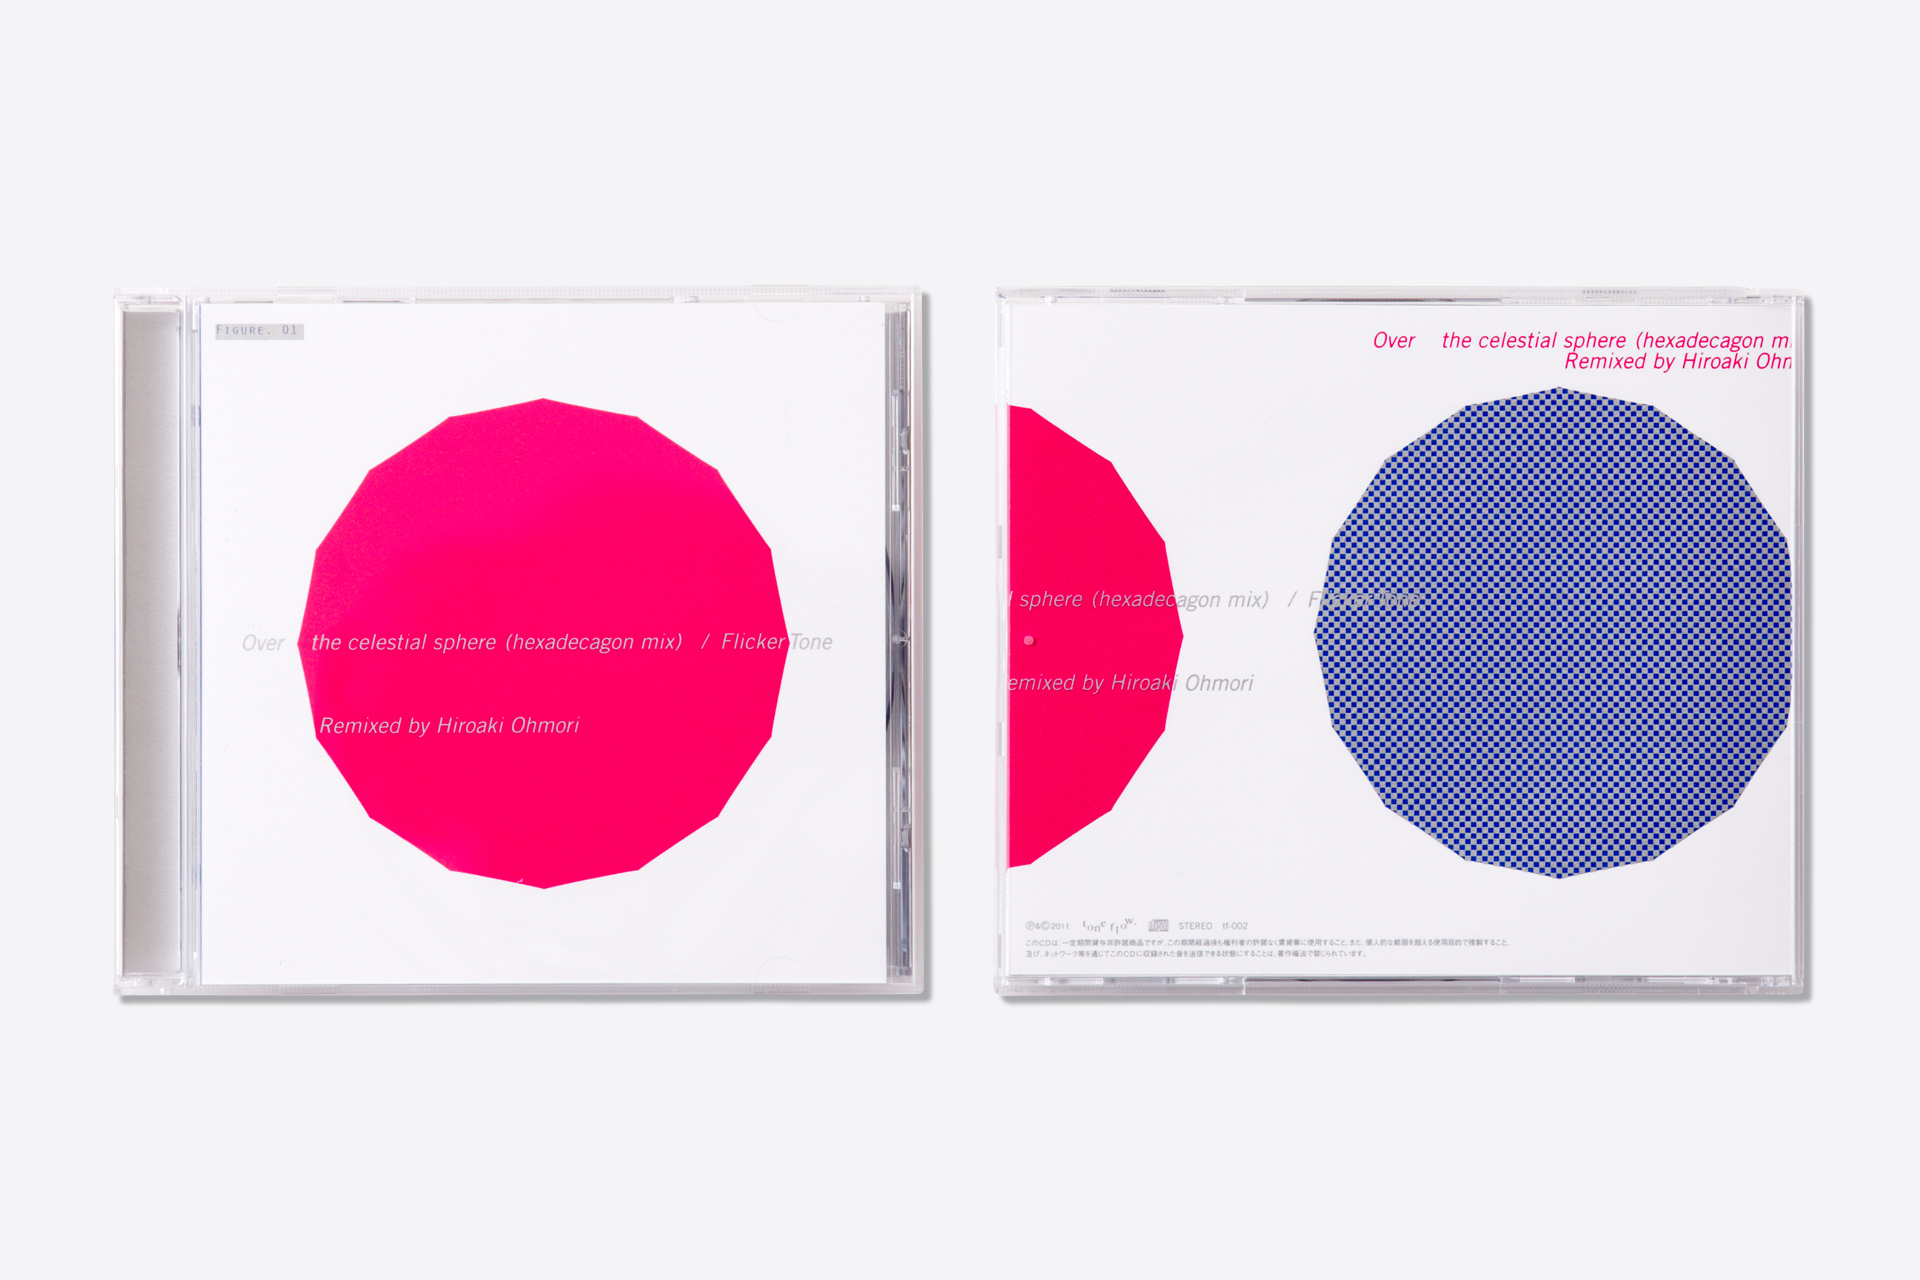 Over the celestial sphere / FlickerTone (hexadecagon mix) Remixed by Hiroaki Ohmori